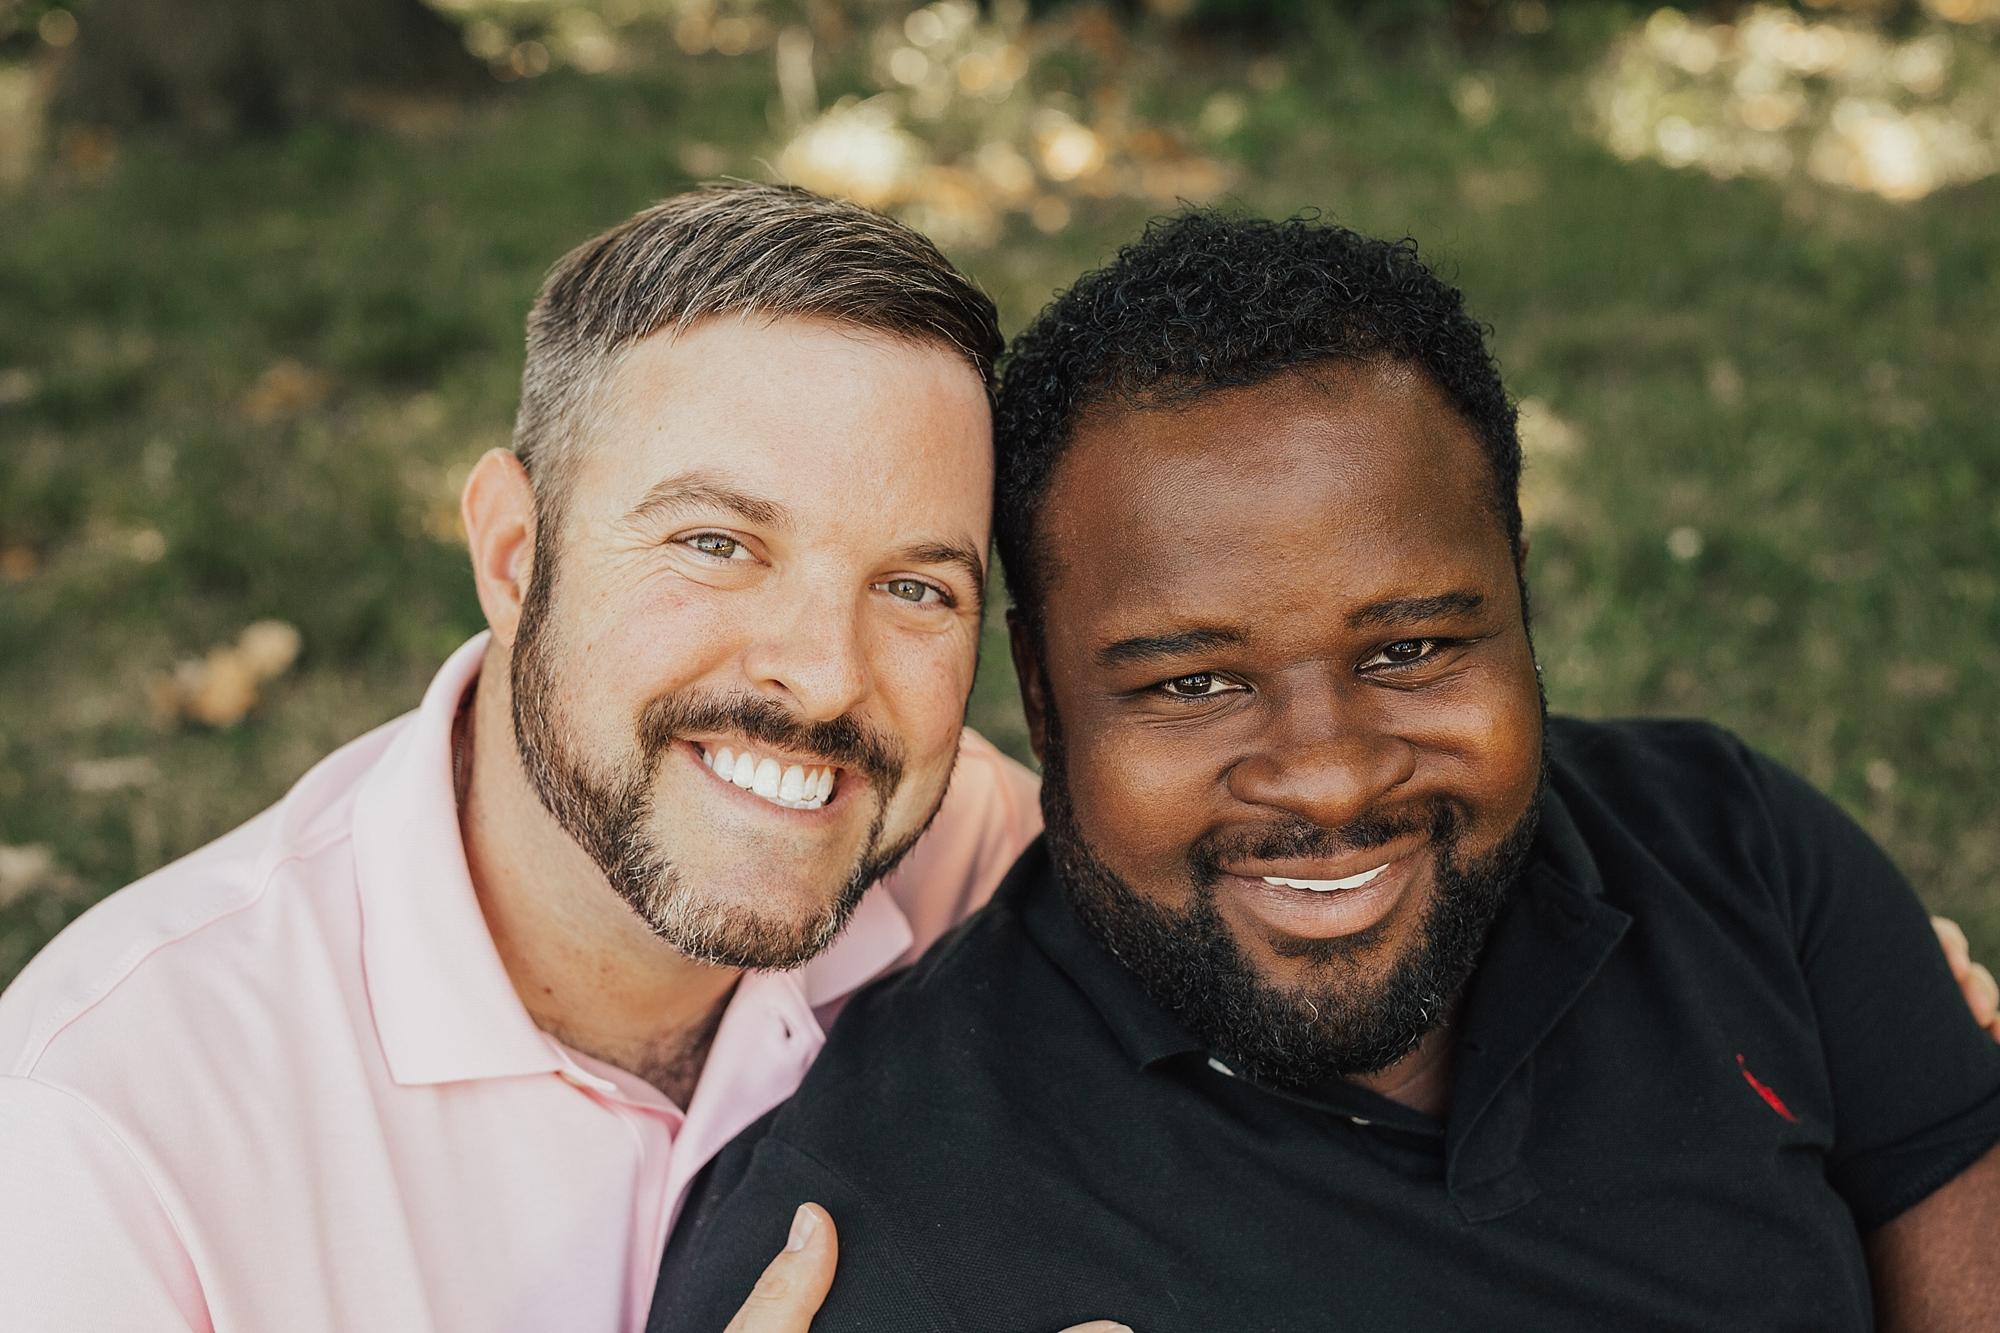 Joe_Mac_Creative_Philadelphia_Philly_LGBT_Gay_Engagement_Wedding_Photography__0003.jpg